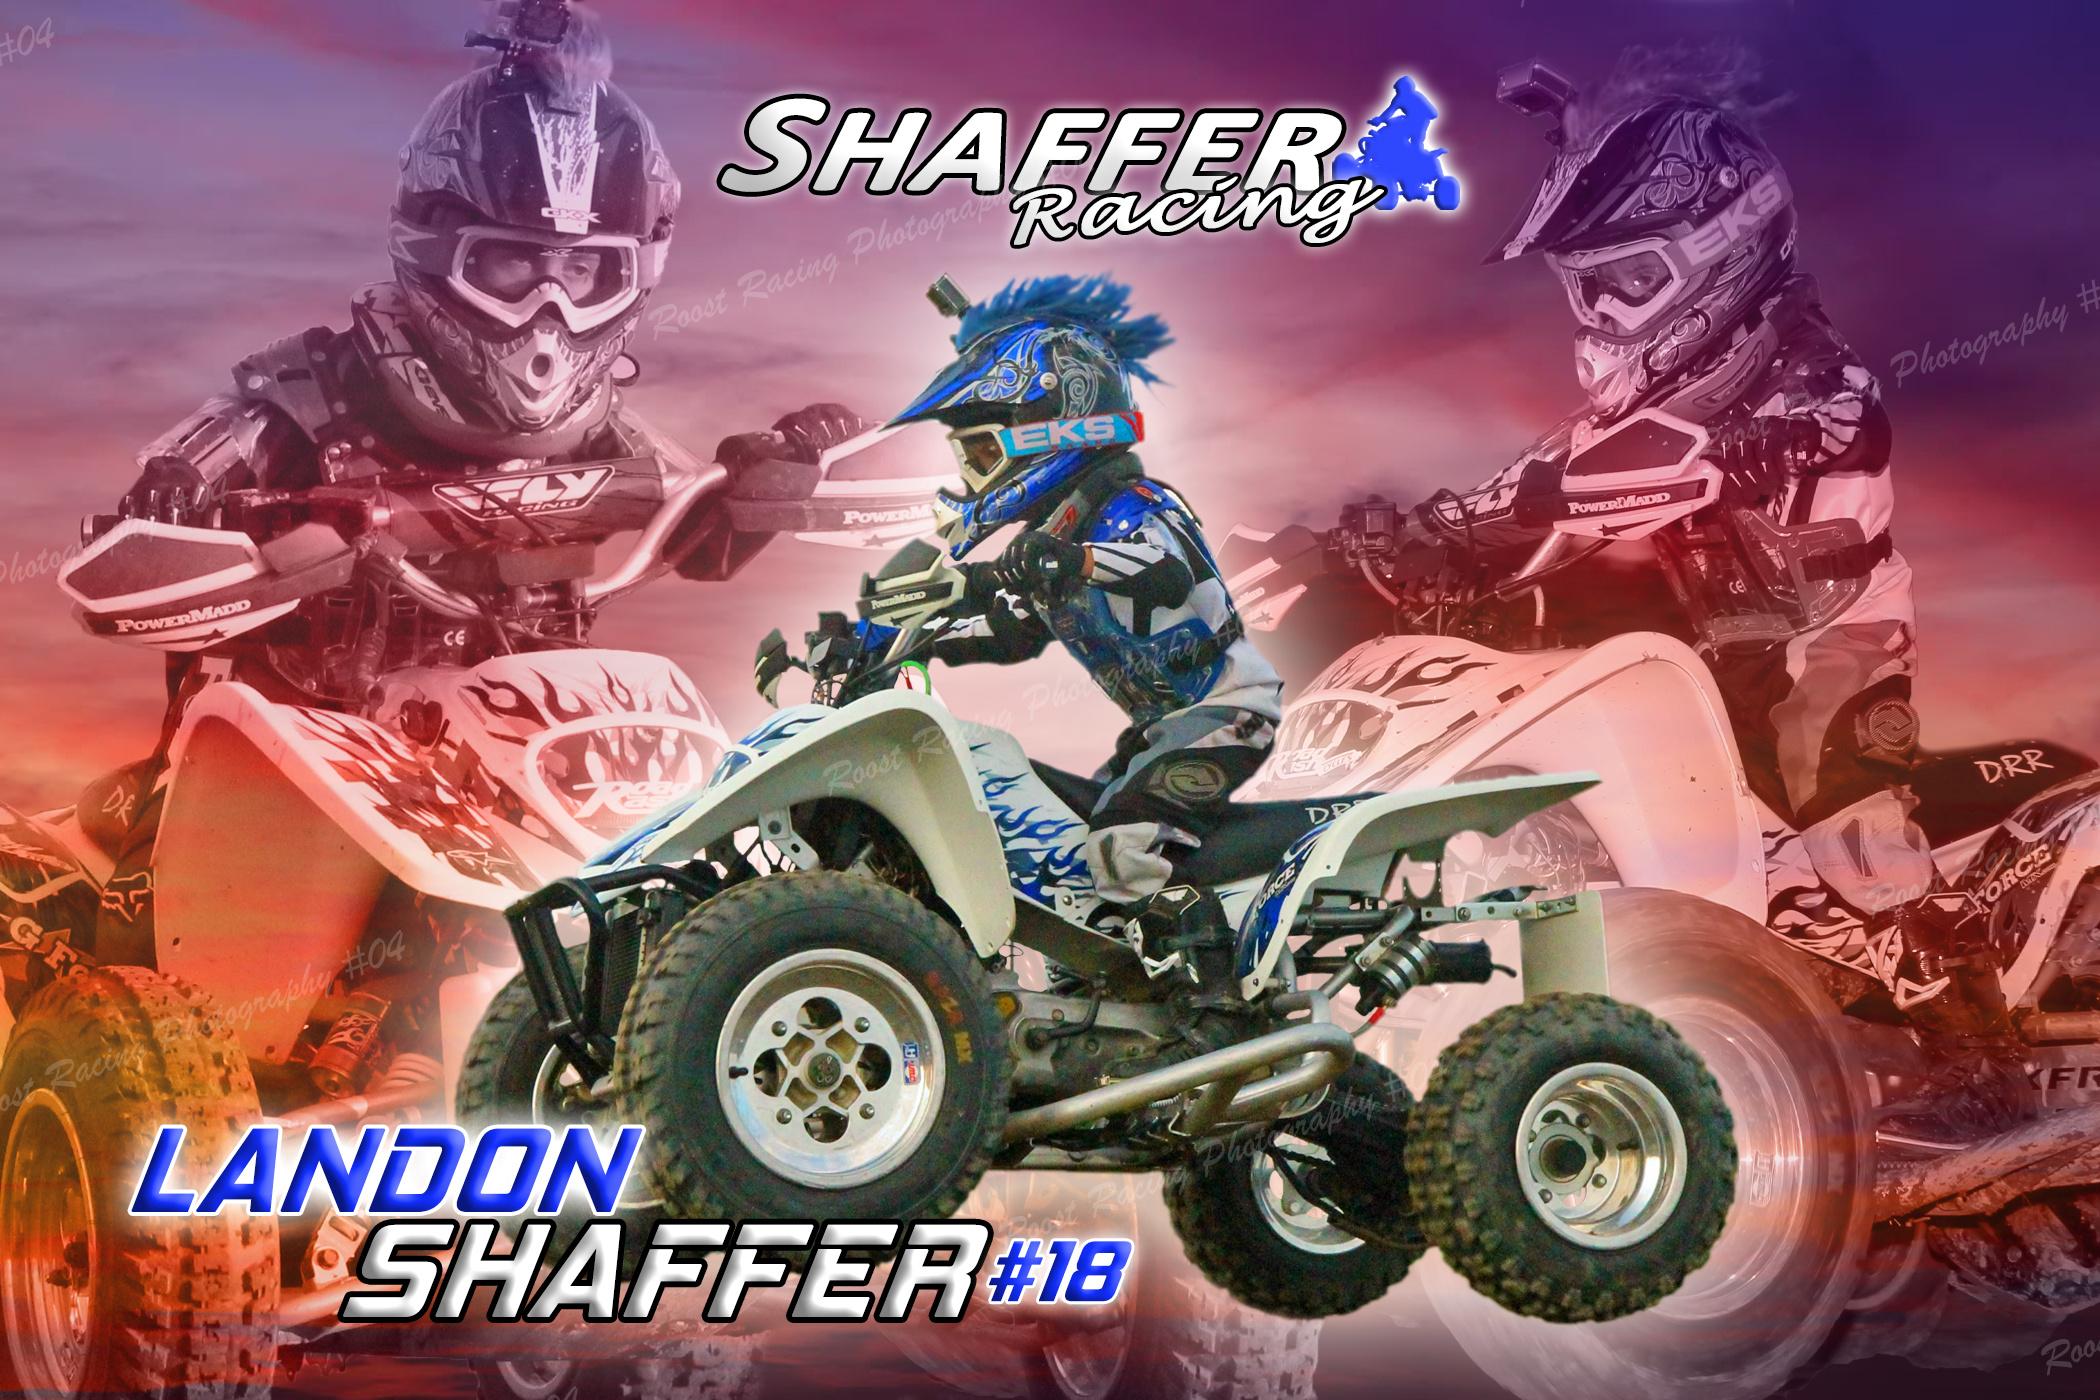 #18 Landon Shaffer